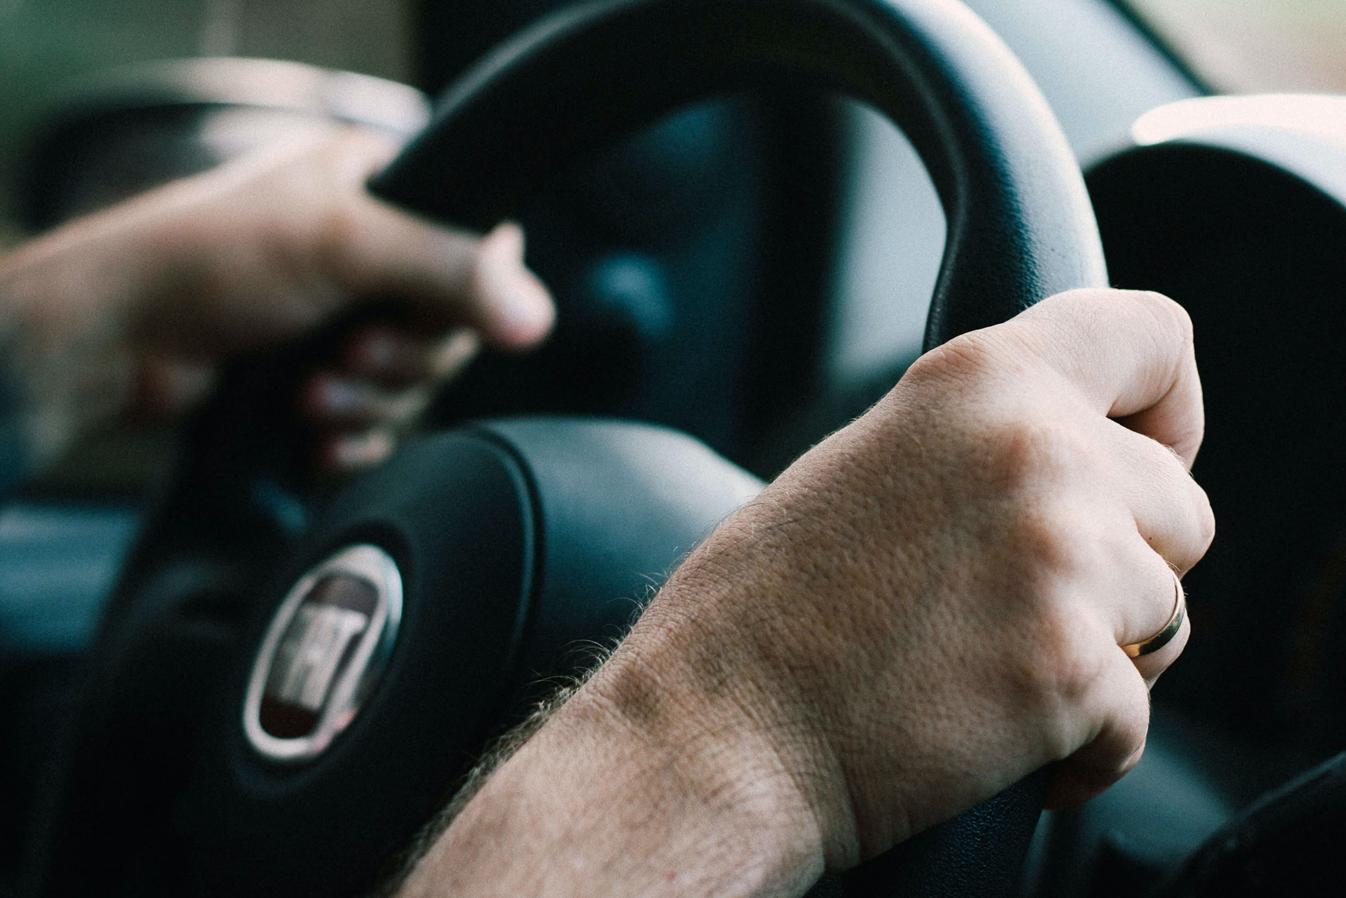 Man's hands on steering wheel; image by Matheus Ferrero, via Unsplash.com.